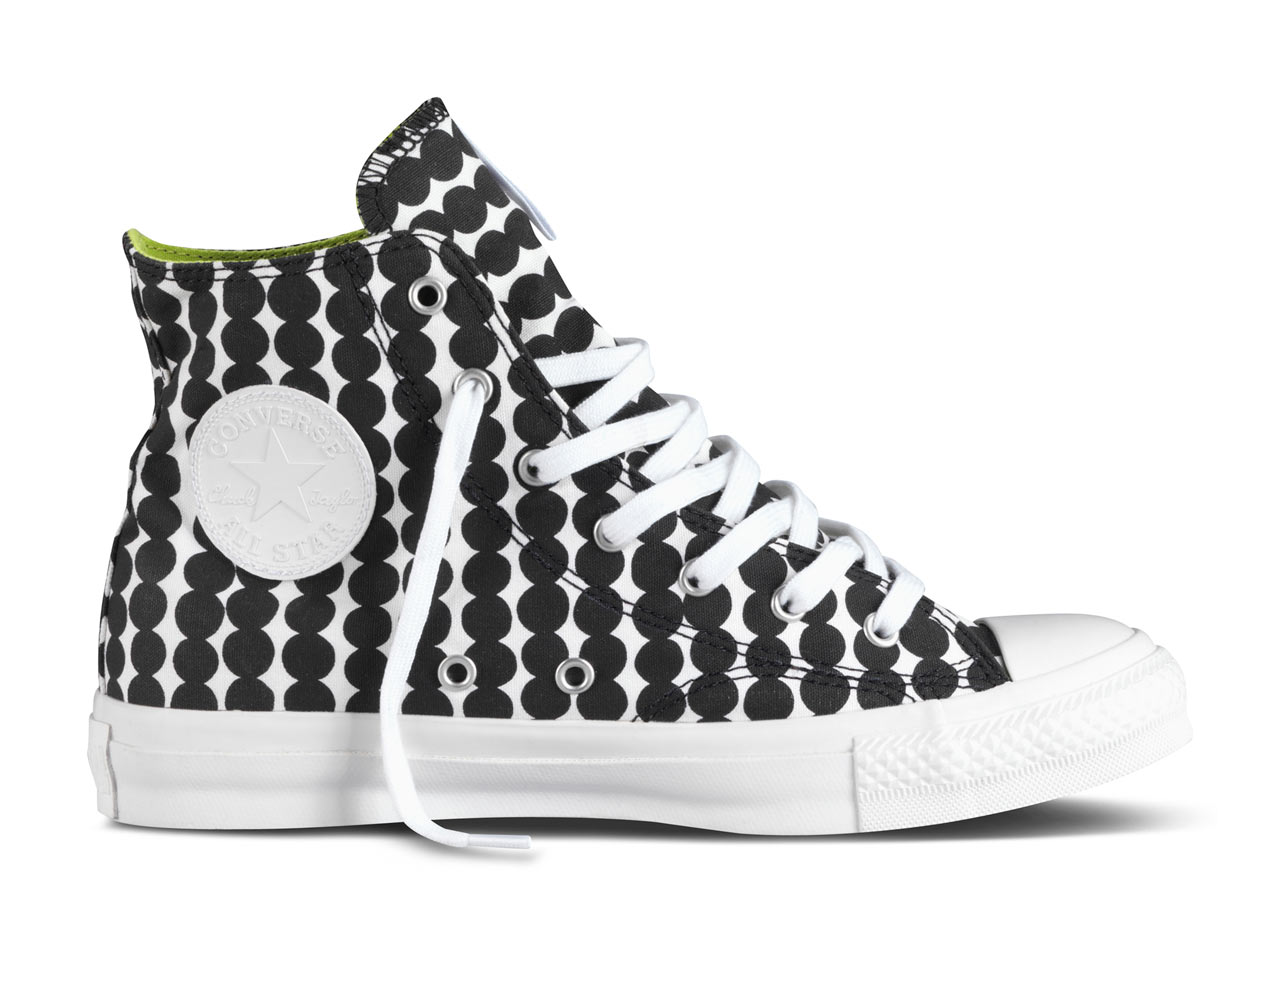 Happy Feet: Converse x Marimekko Shoes Spring 2013